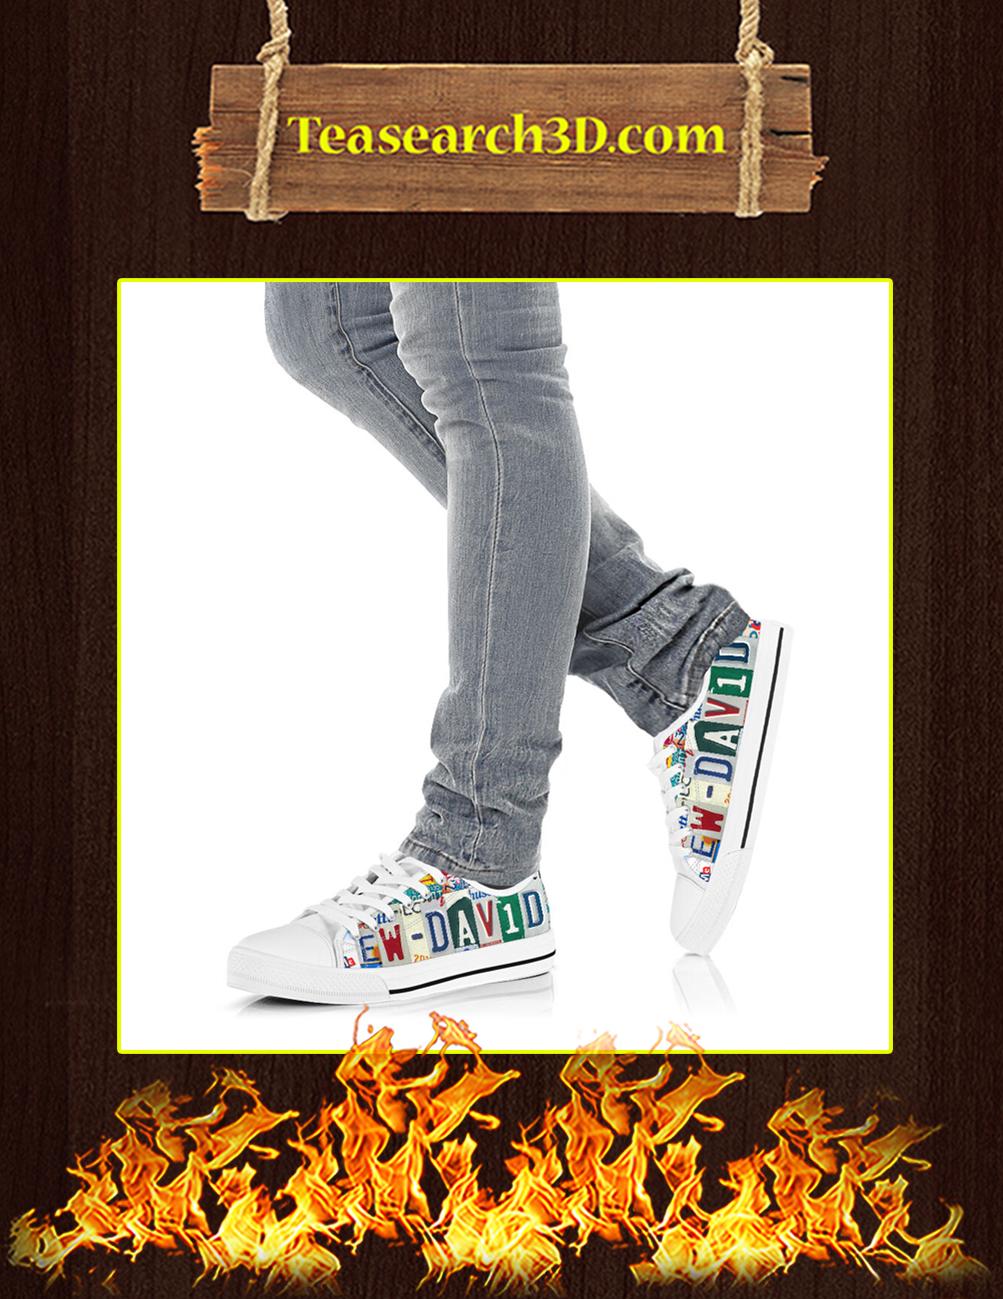 Ew David Low Top Shoes pic 3